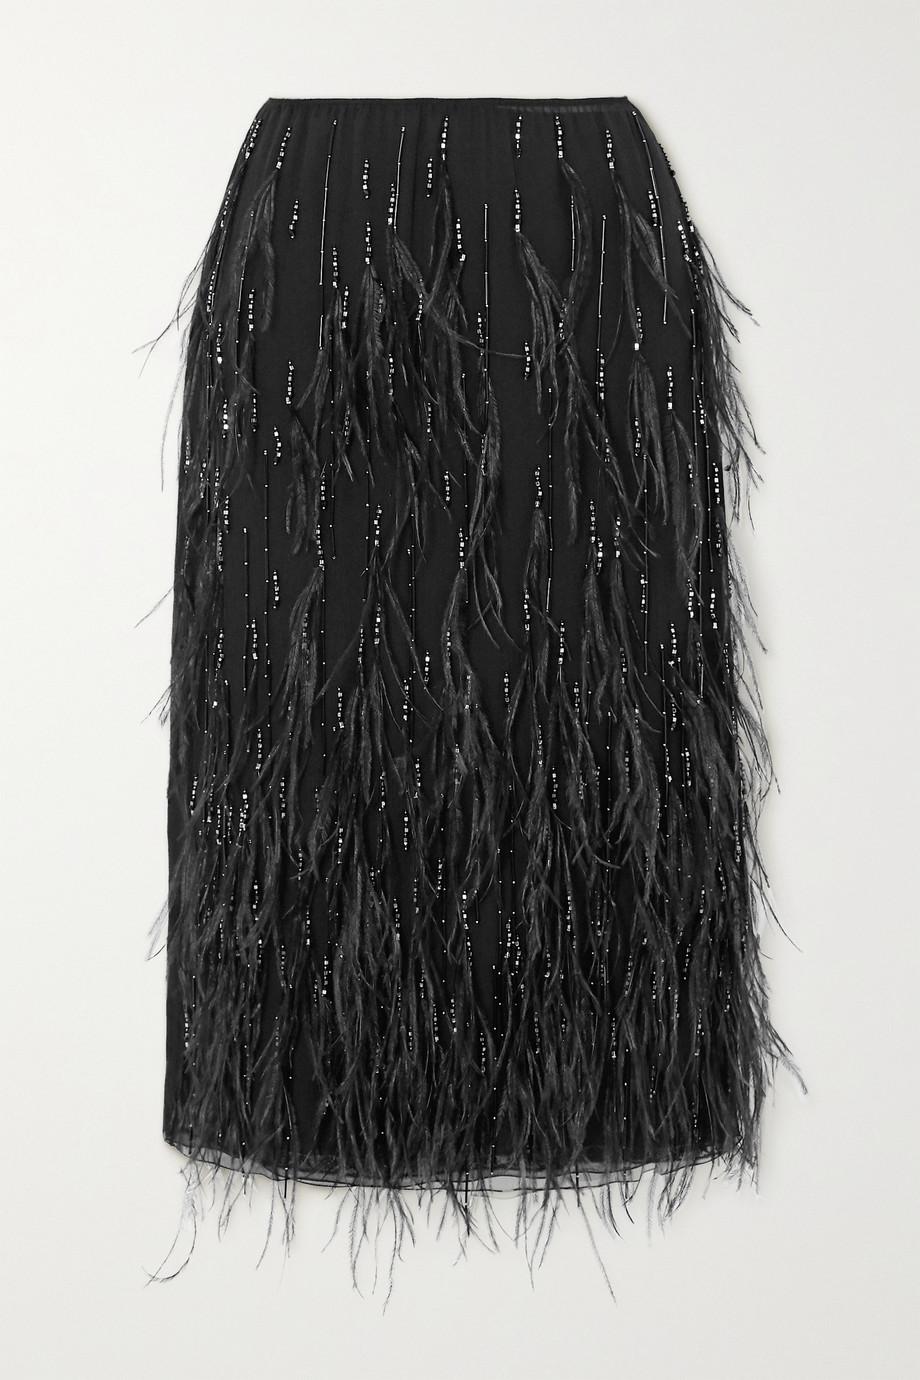 Prada Feather and bead-embellished crinkled-chiffon midi skirt